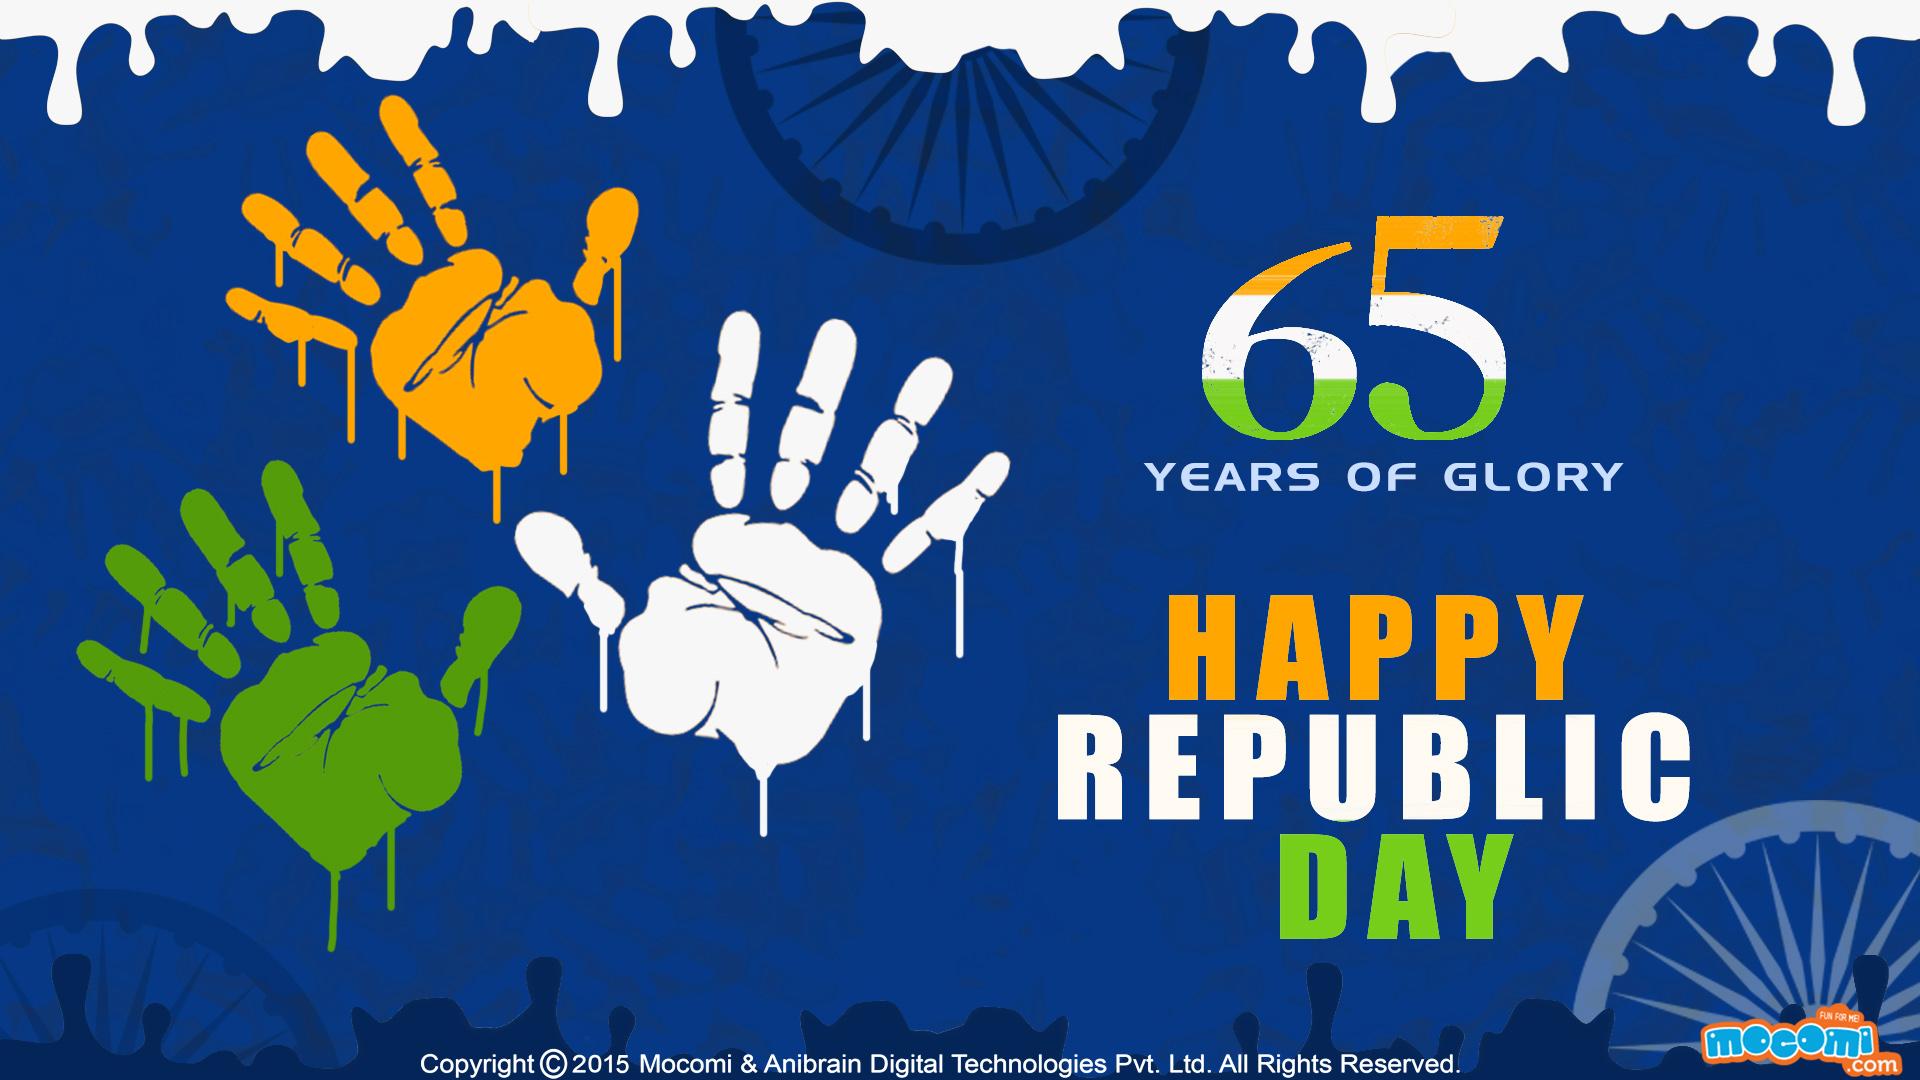 Happy Republic Day Wallpaper – 6